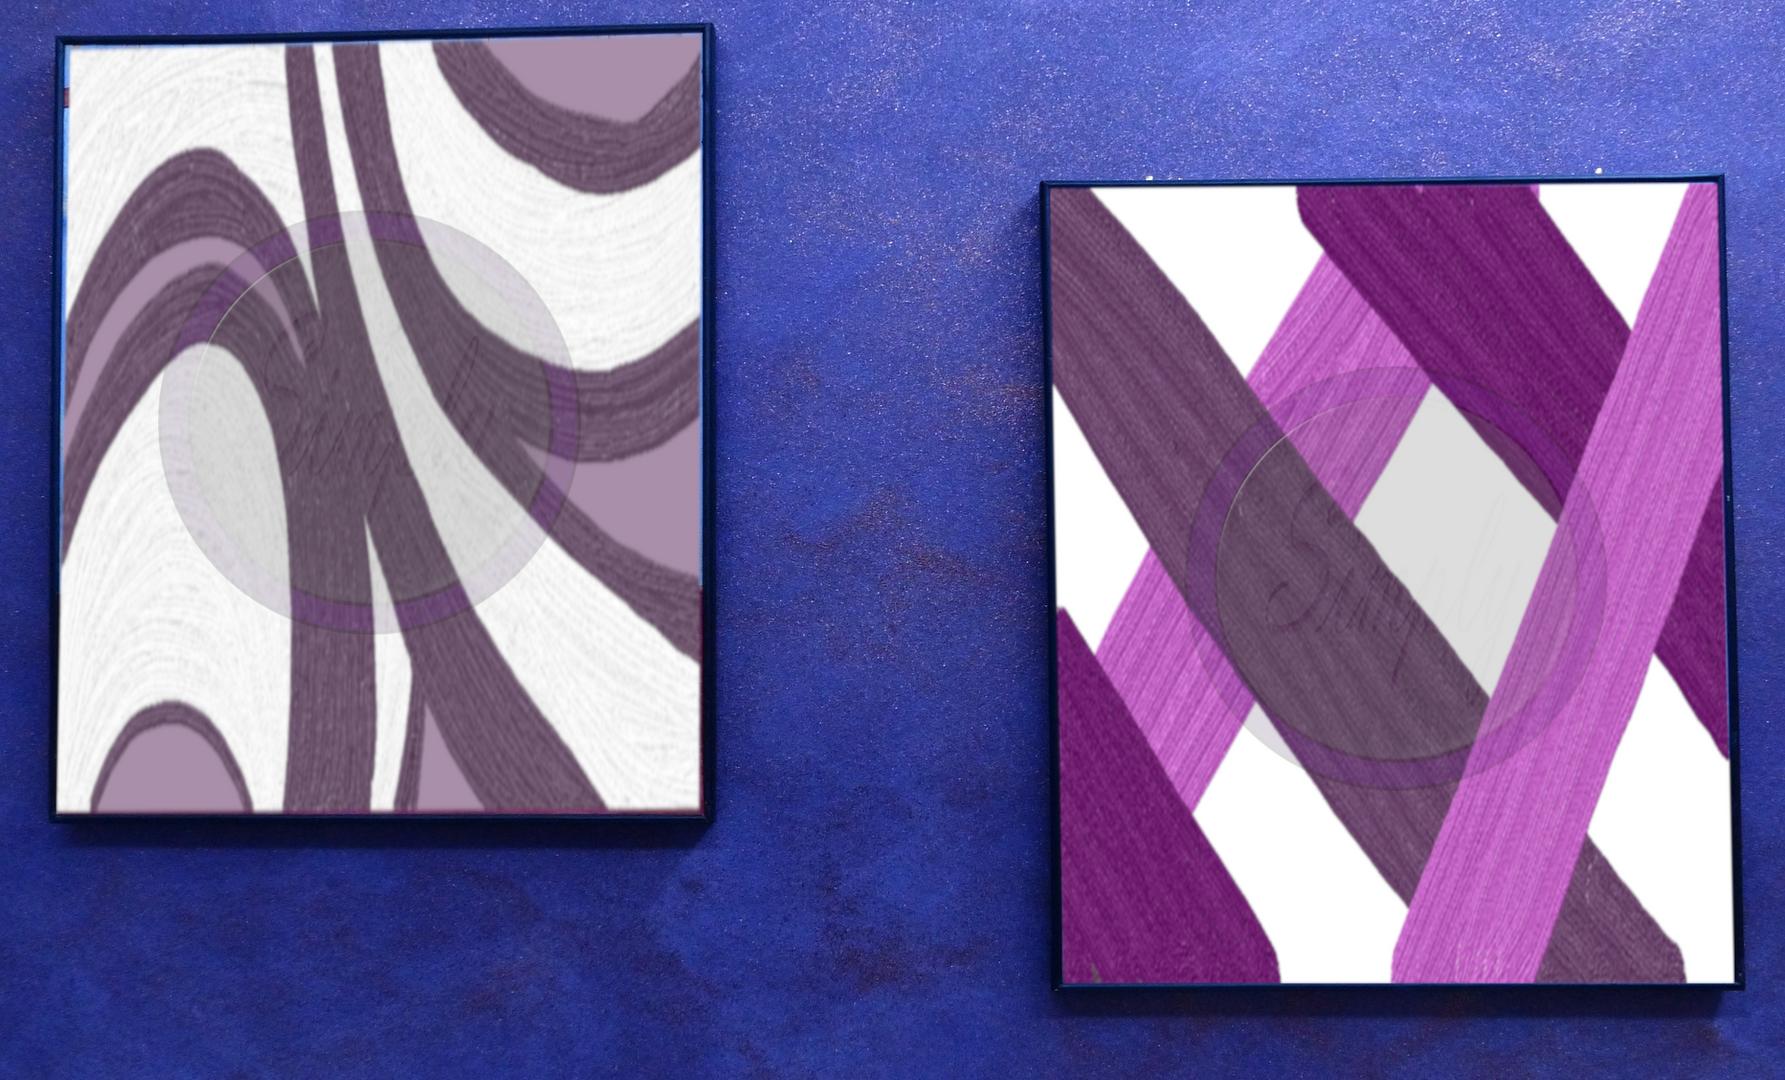 purpletwoframemockup2.png